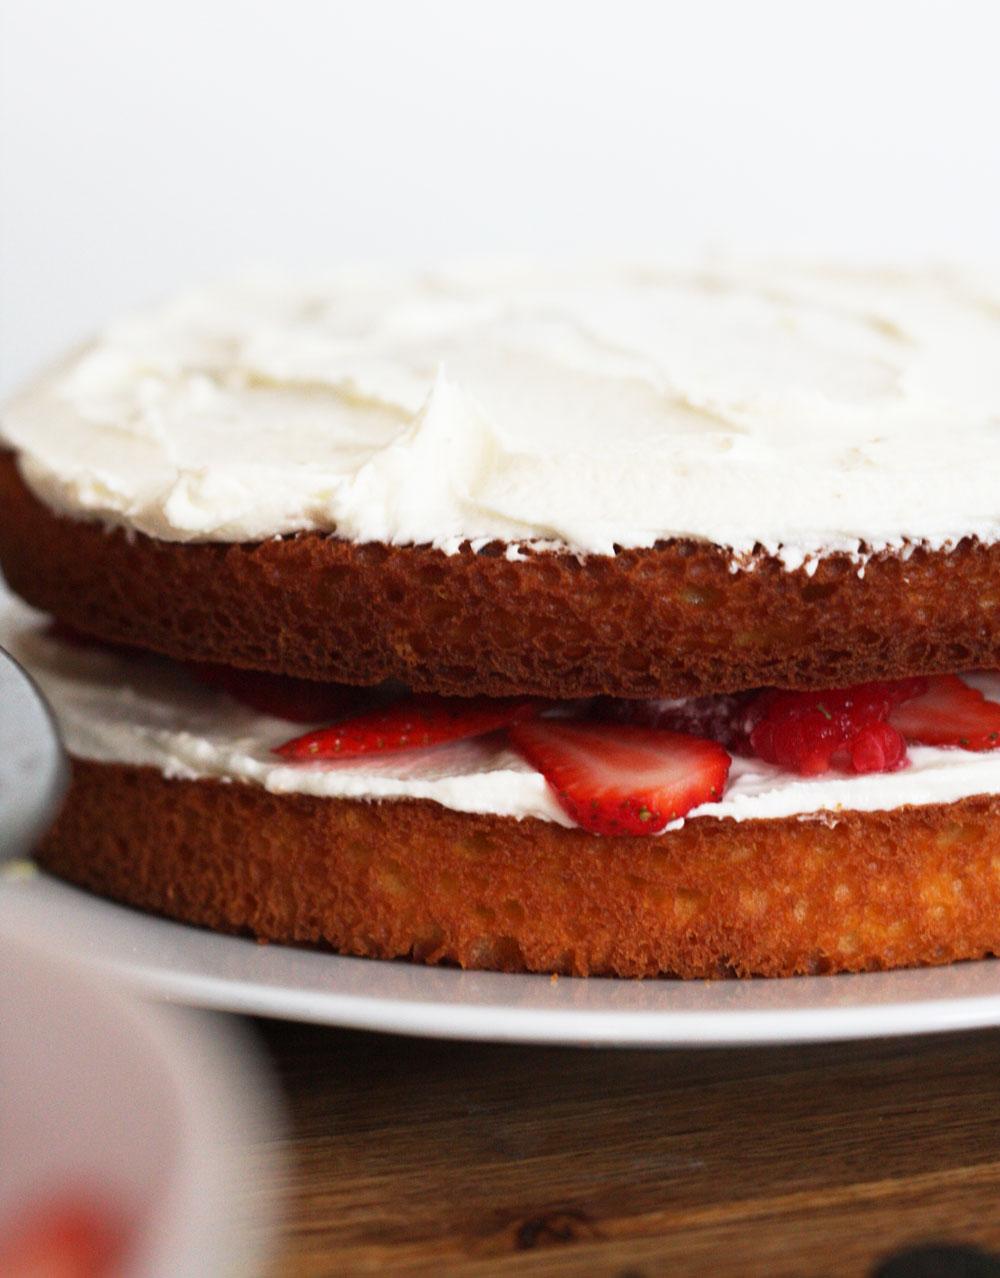 jestcafe.com-babyshower-and-naked-cake7